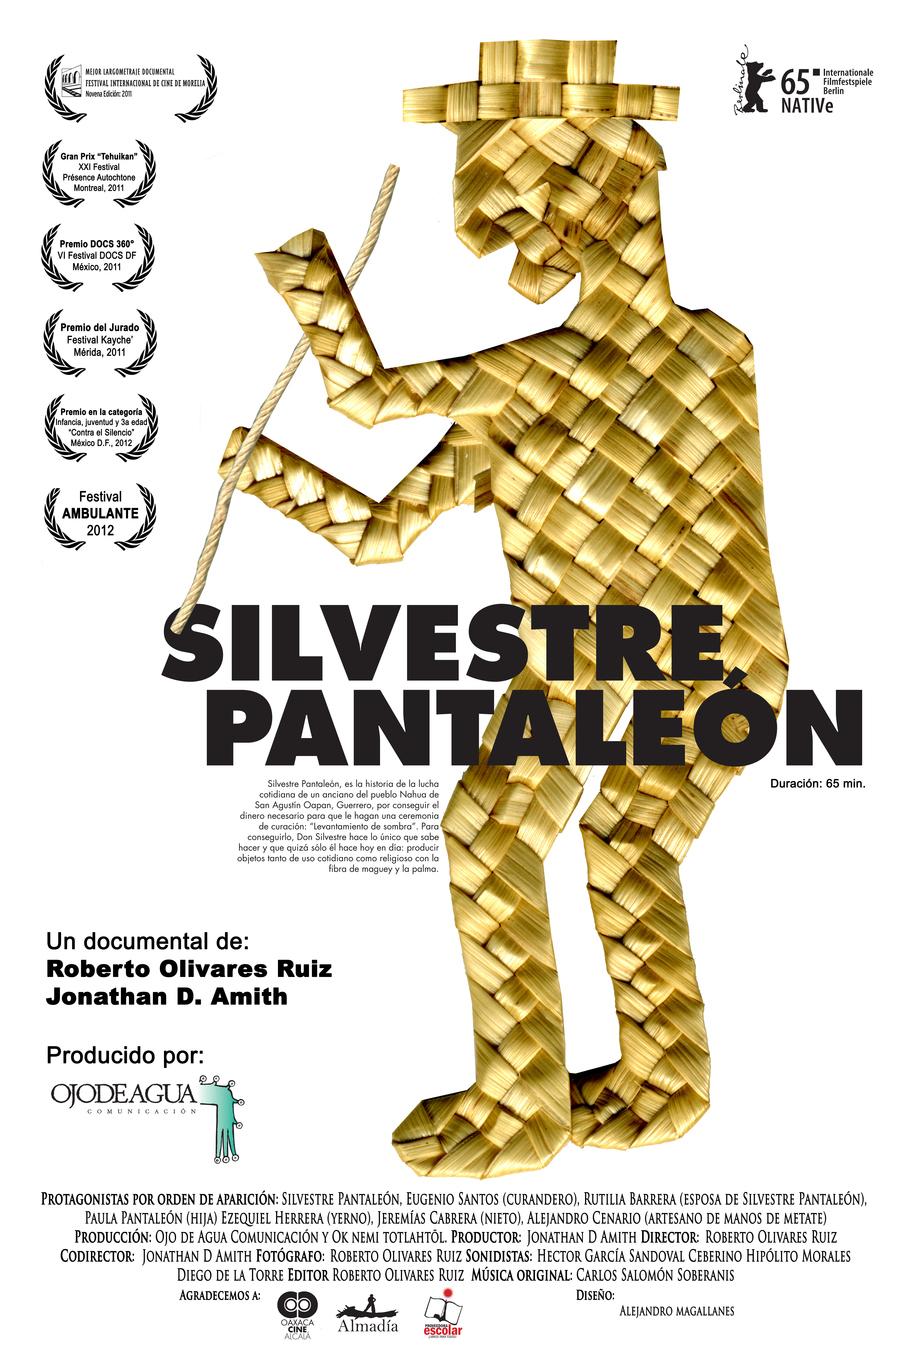 Silvestre Pantaleón